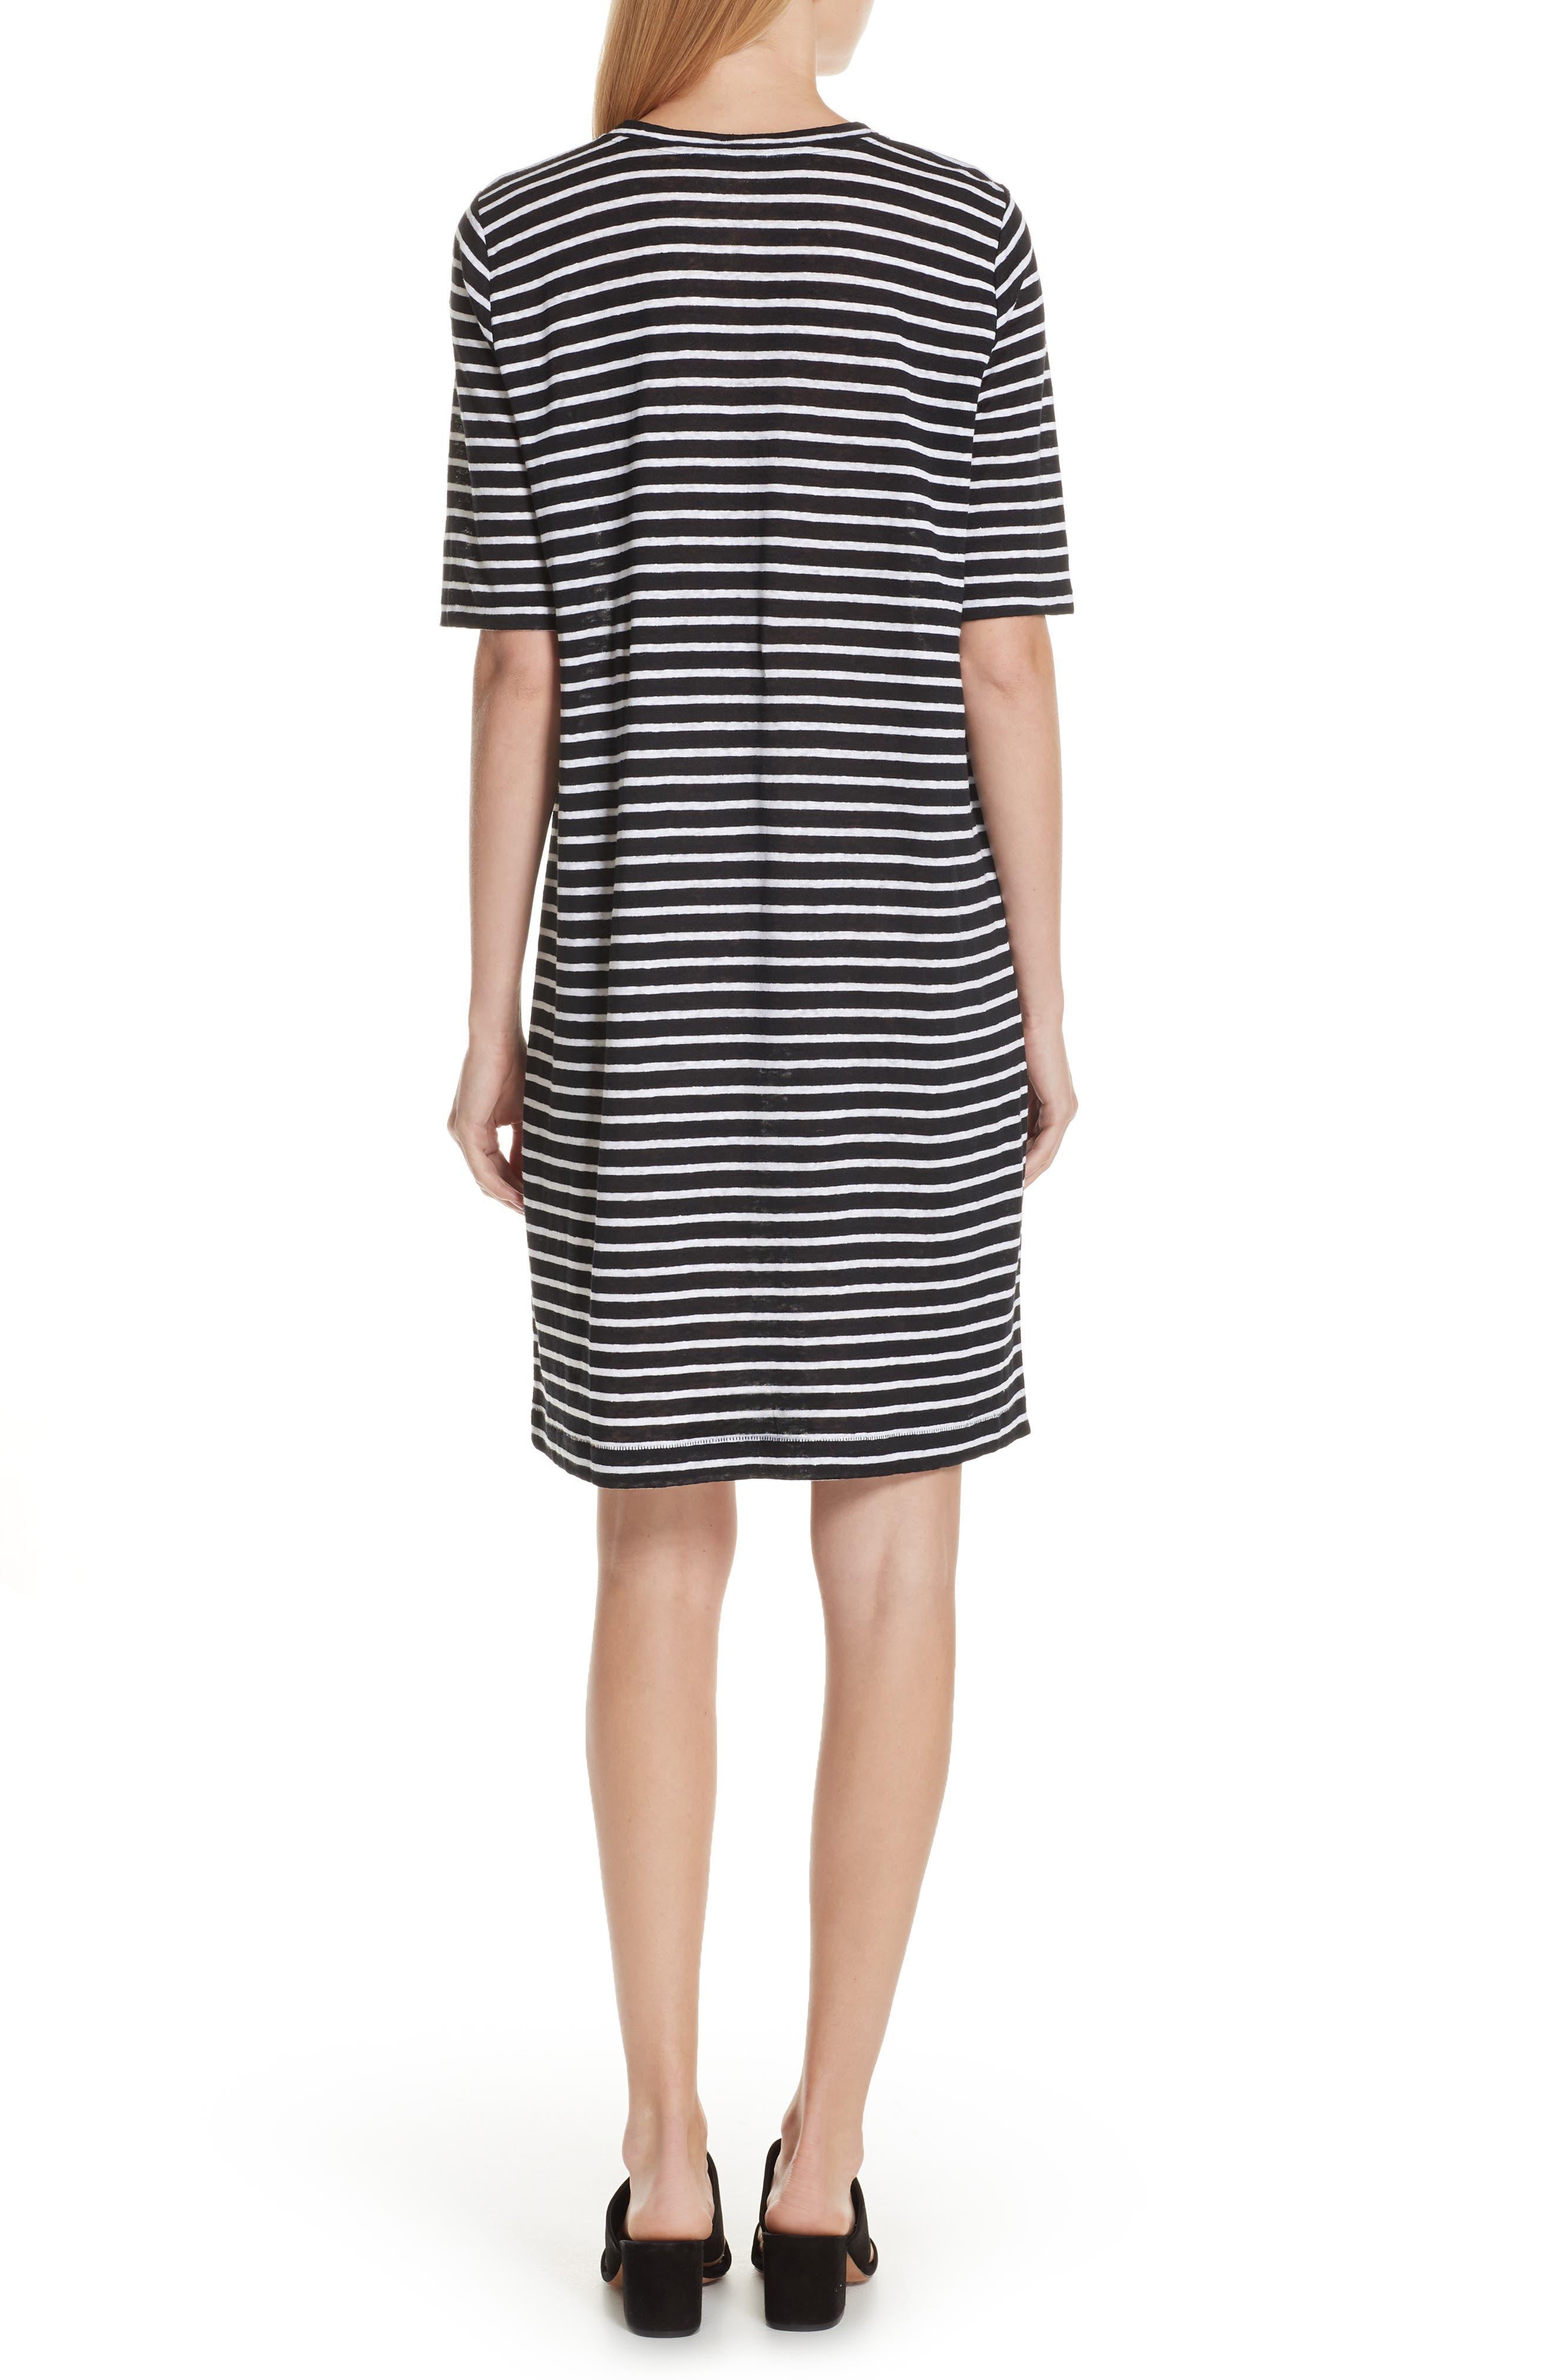 Stripe Organic Linen Knit Shift Dress,                             Alternate thumbnail 2, color,                             Black/ White